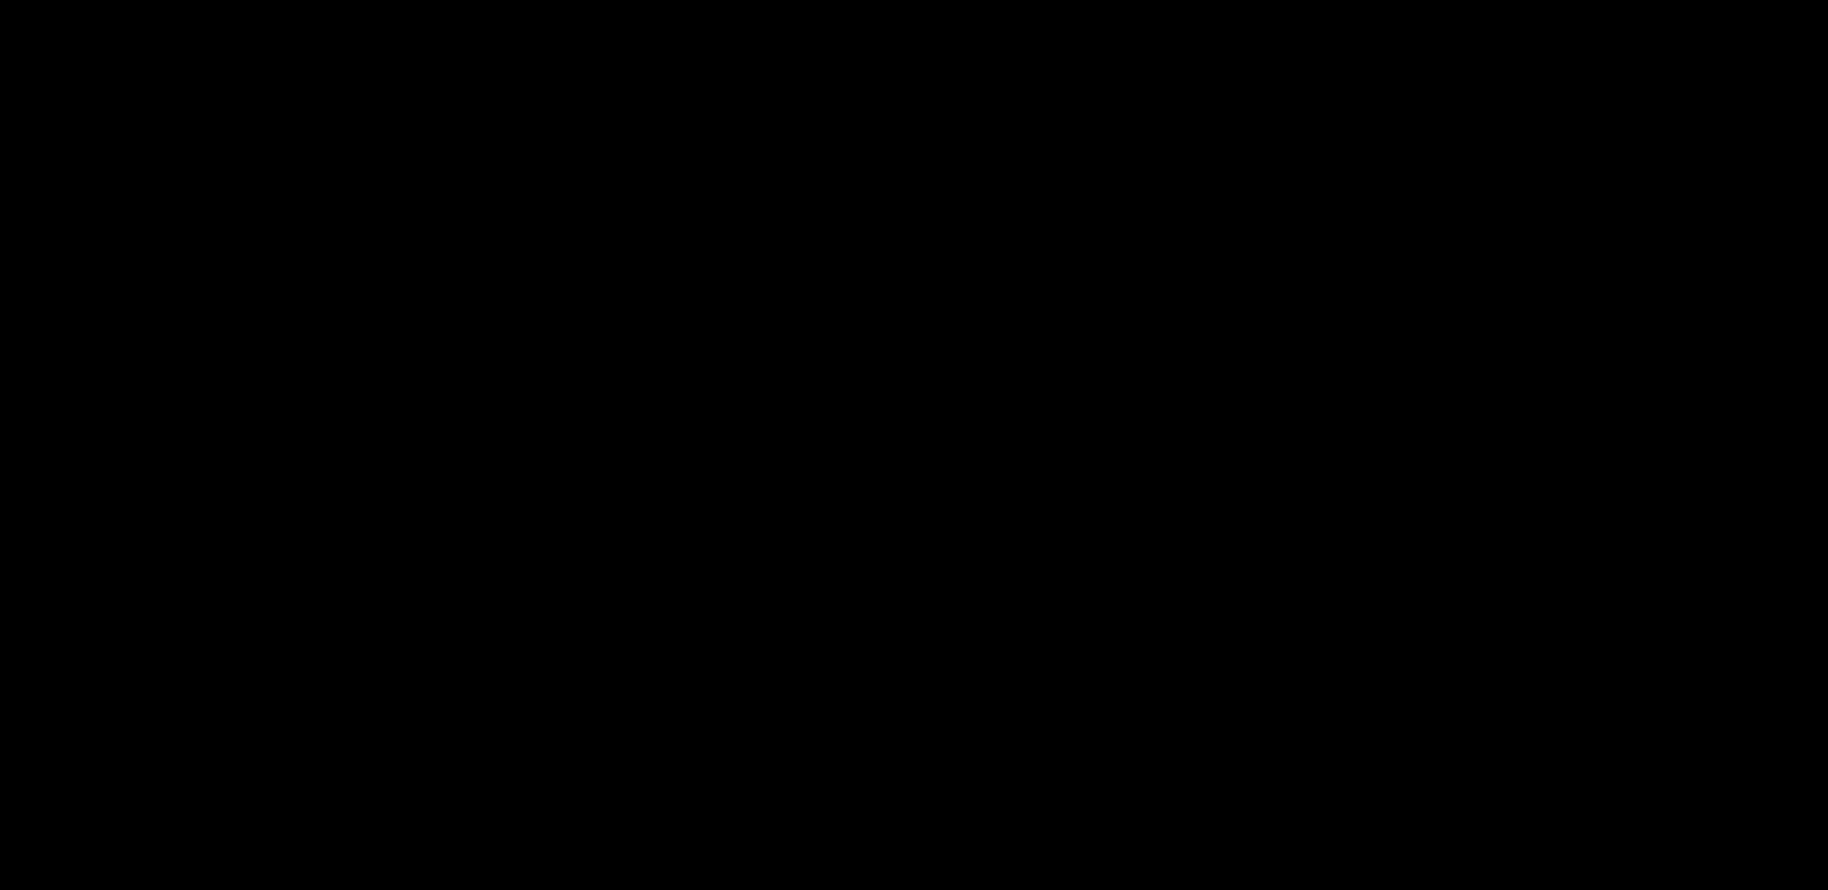 rb1-2-26